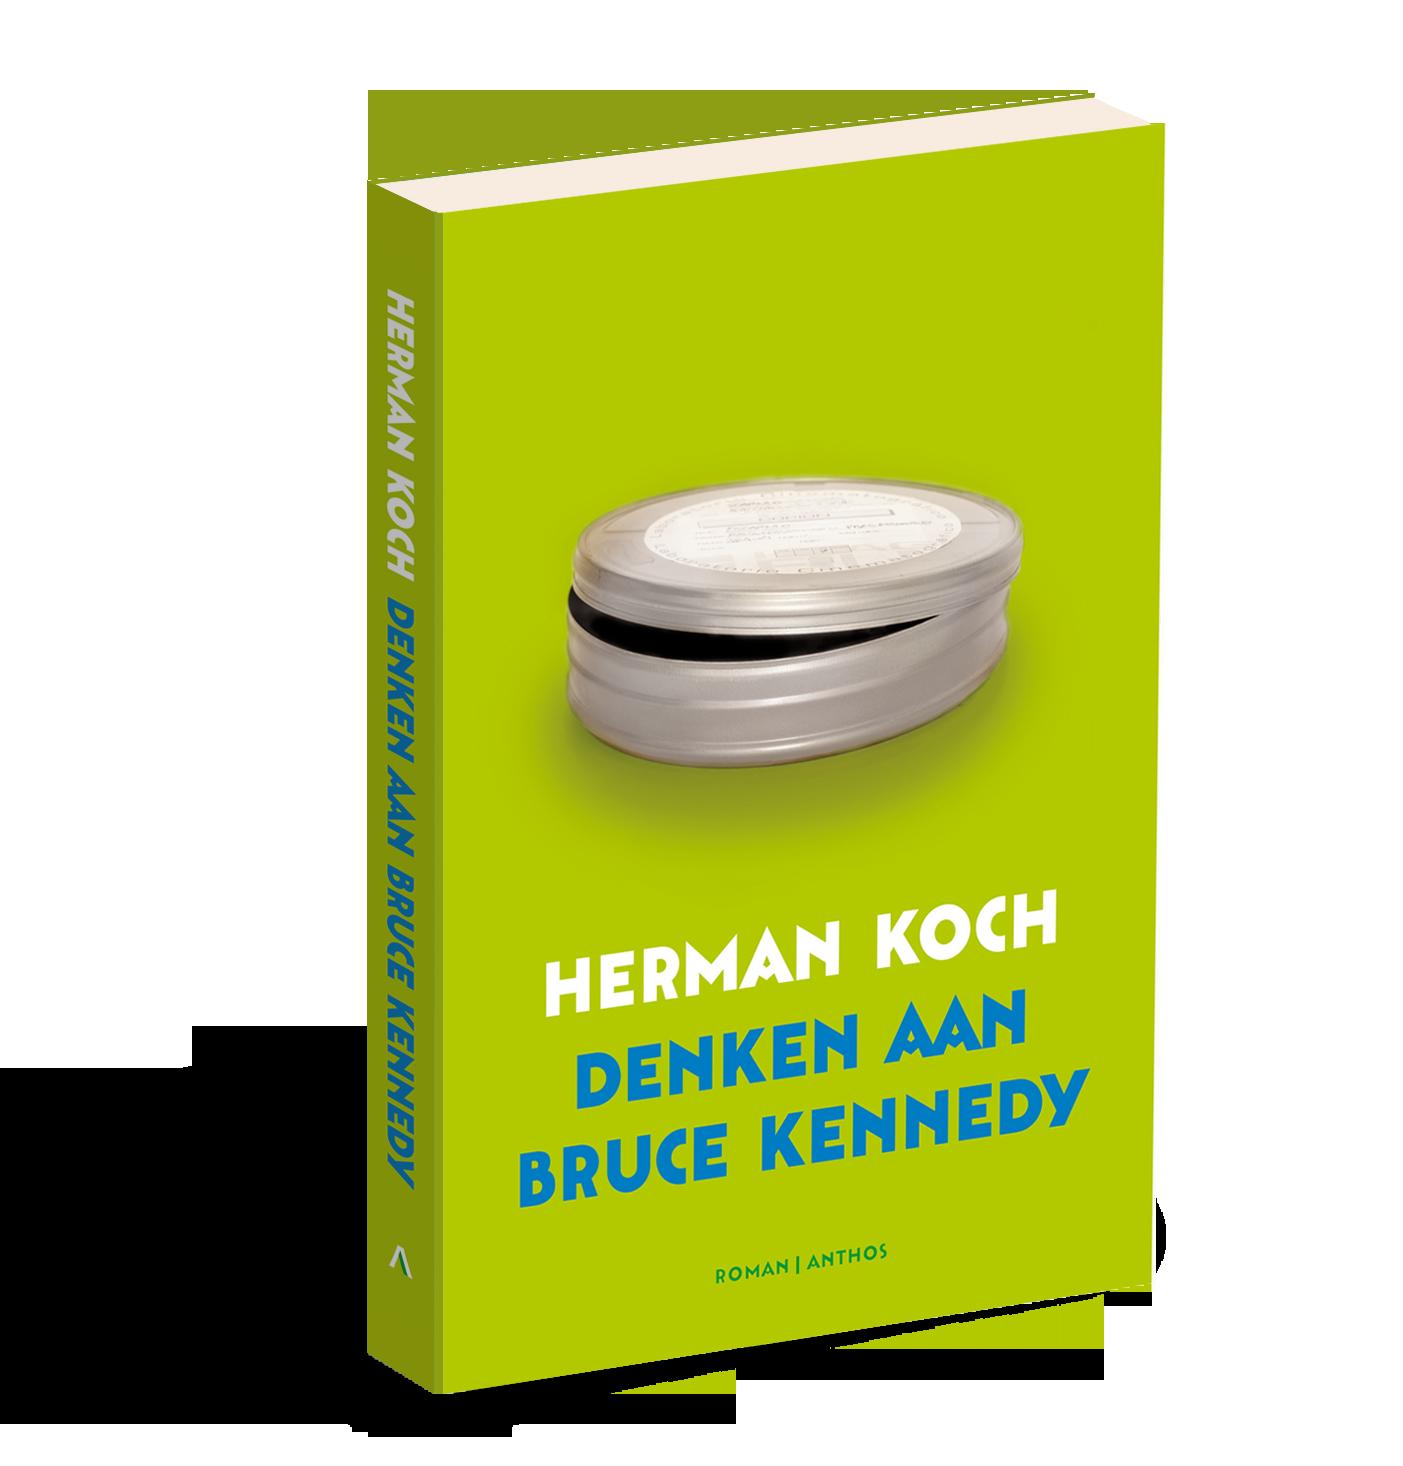 Thinking of Bruce Kennedy